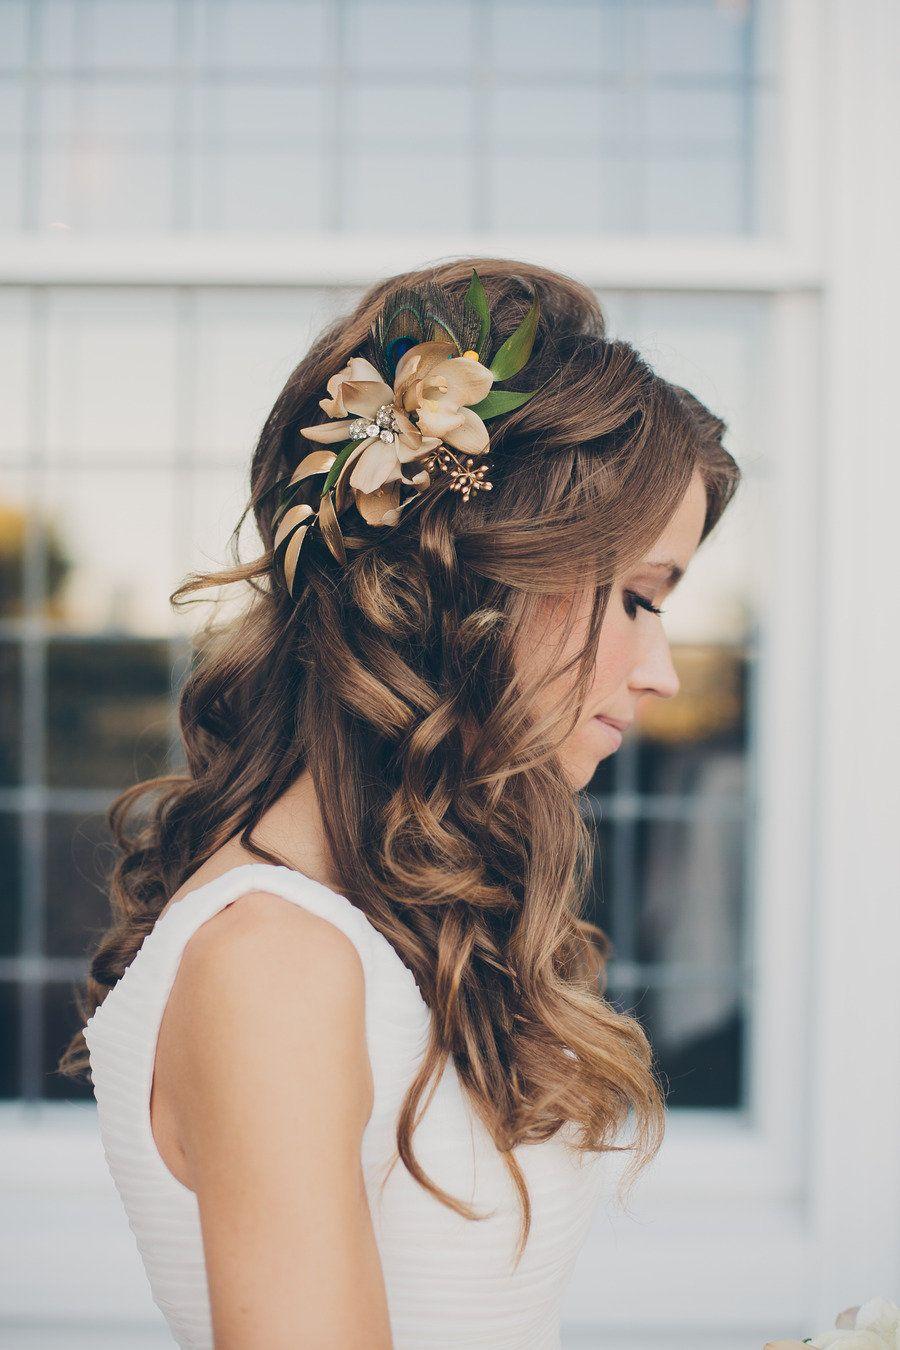 Edmonton wedding from mango studios bella figura hair and makeup